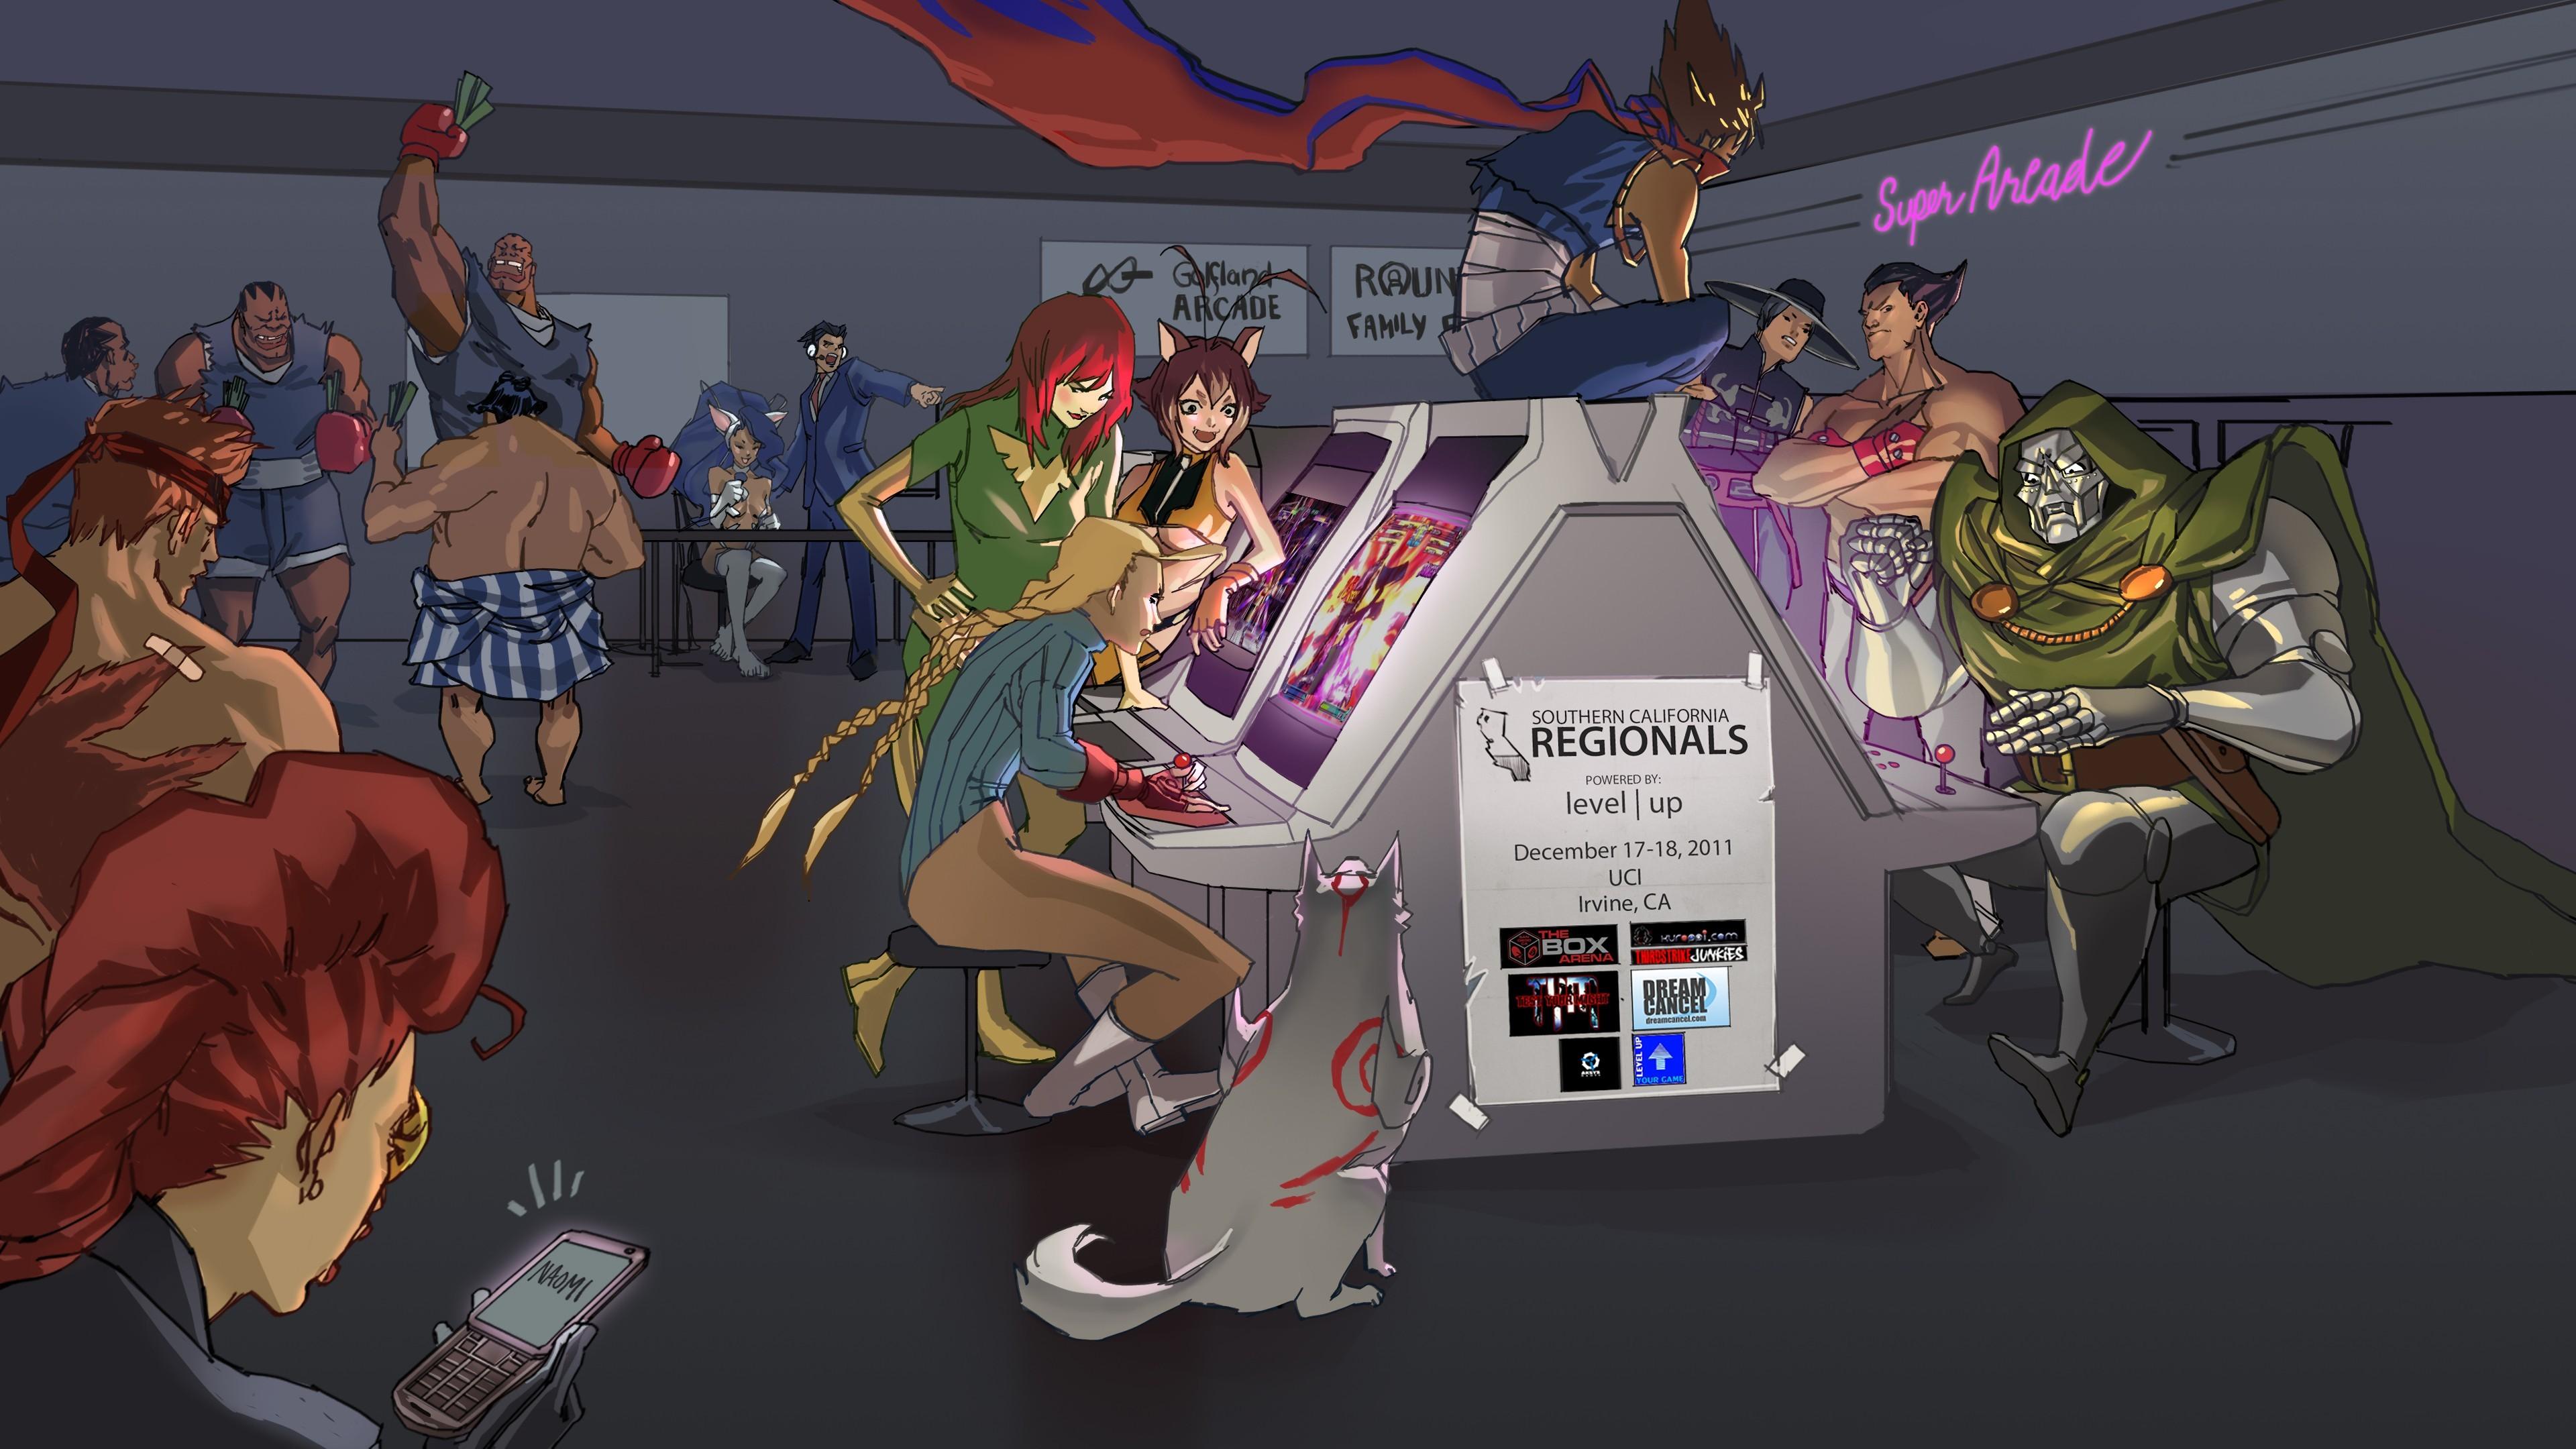 Wallpaper : illustration, anime, cartoon, Street Fighter, comics